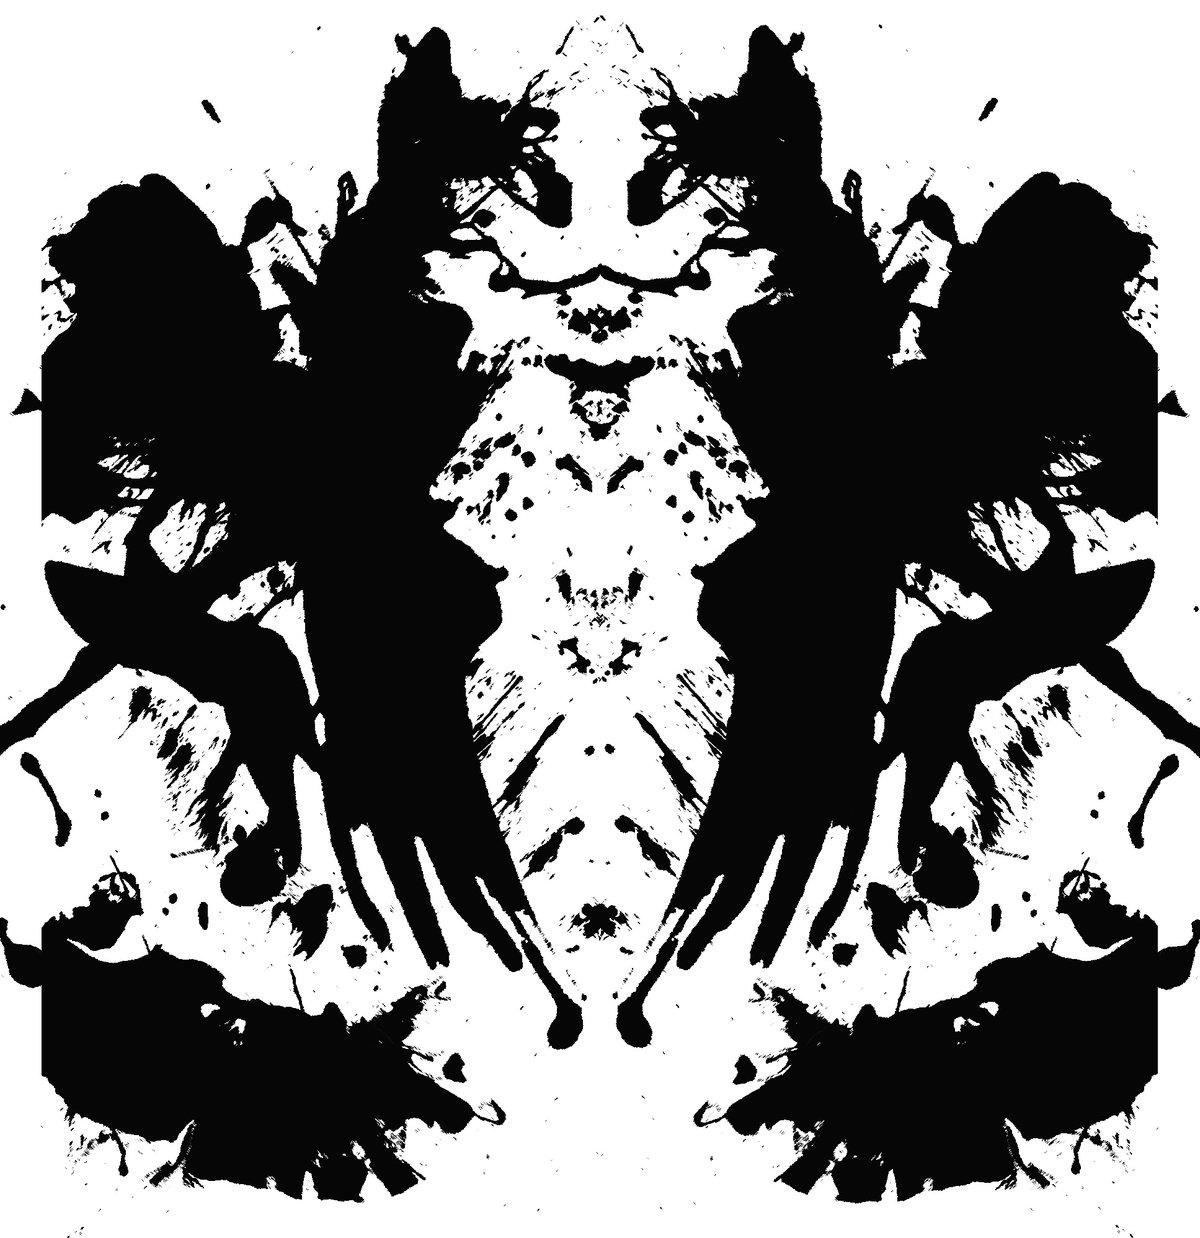 технологического процесса тест роршаха пройти все картинки четвертой части темного